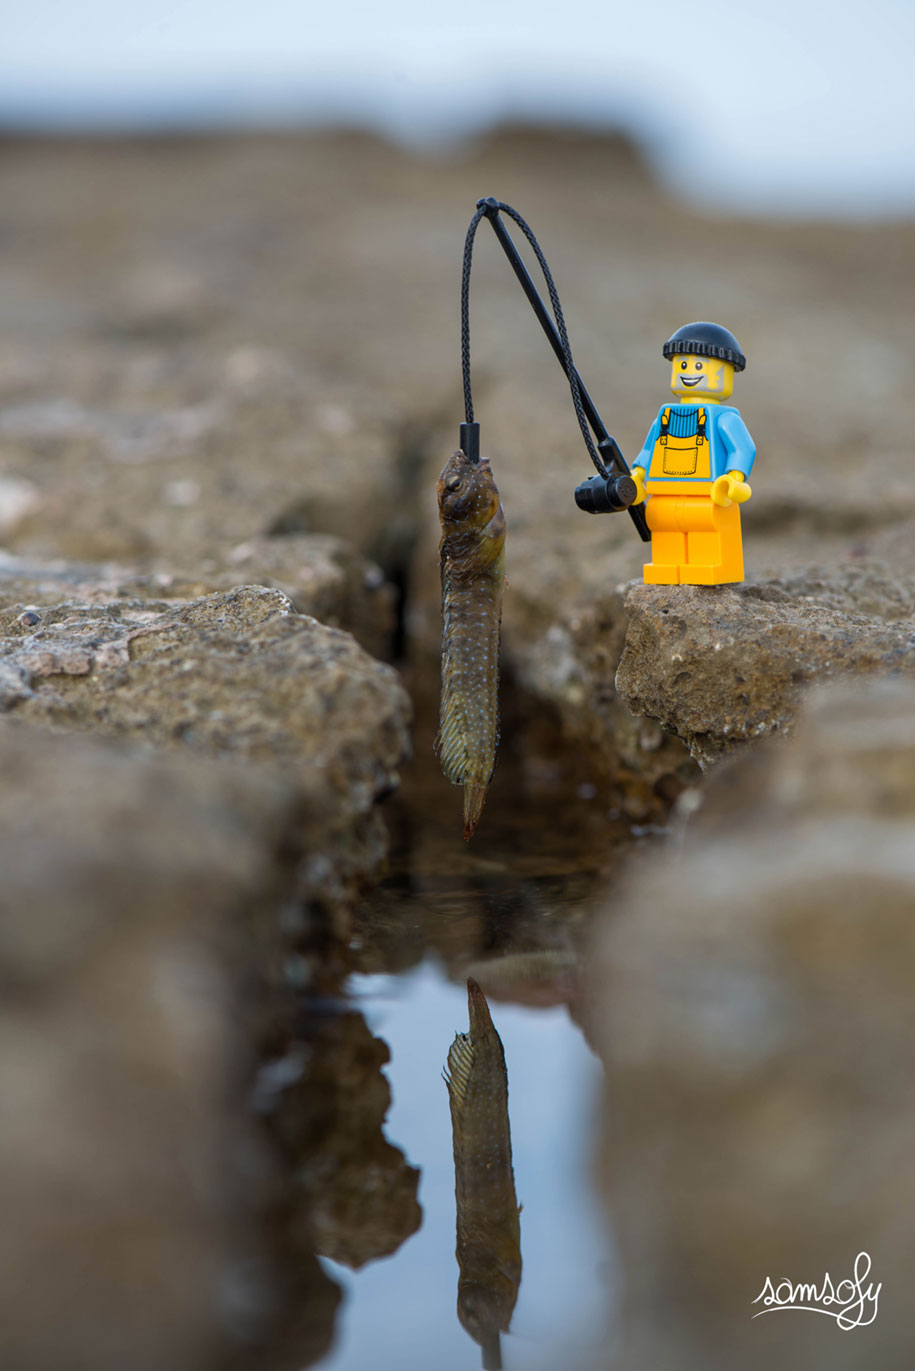 more-lego-miniature-adventures-sofiane-samlal-samsofy-3